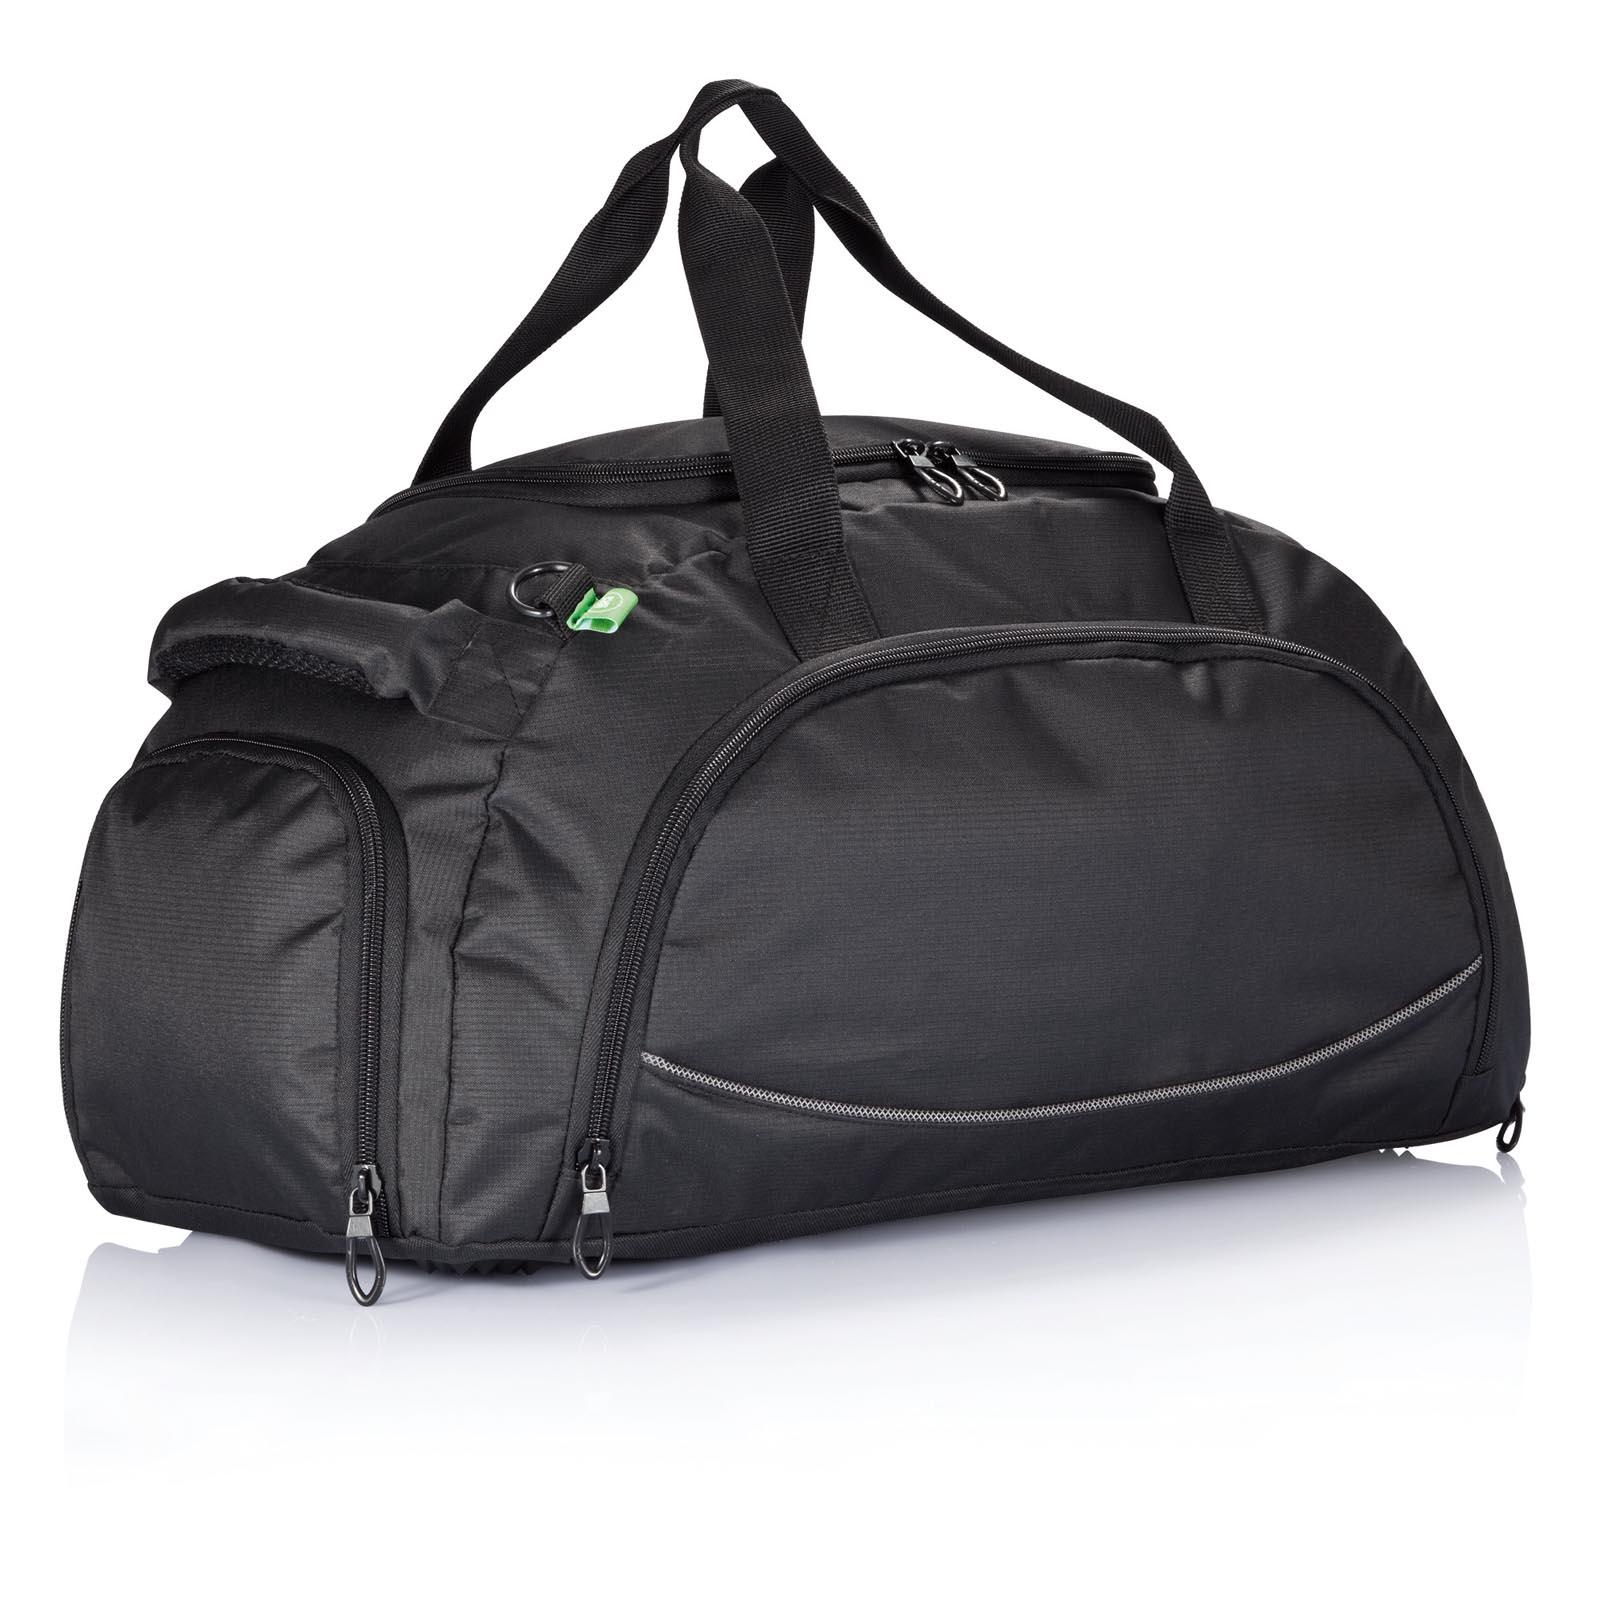 sac a dos usa sport publicitaire sportibag kxin703731 le sportibag sacs de voyage promotionnels. Black Bedroom Furniture Sets. Home Design Ideas